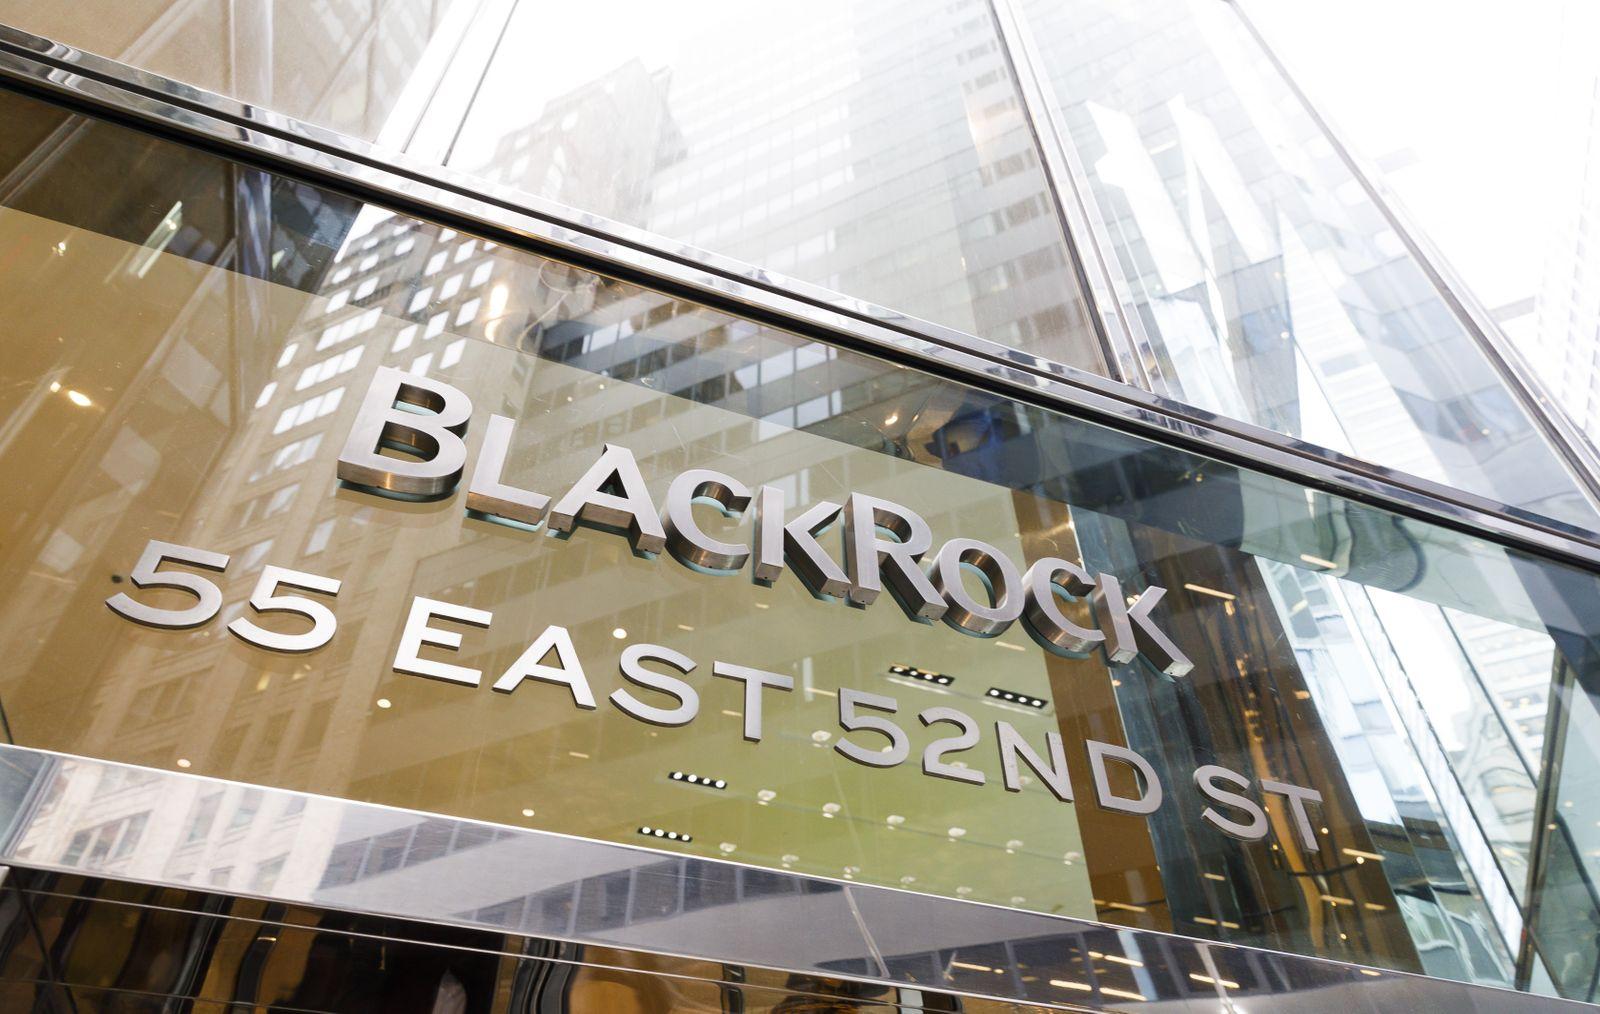 BlackRock results, New York, USA - 16 Jan 2020